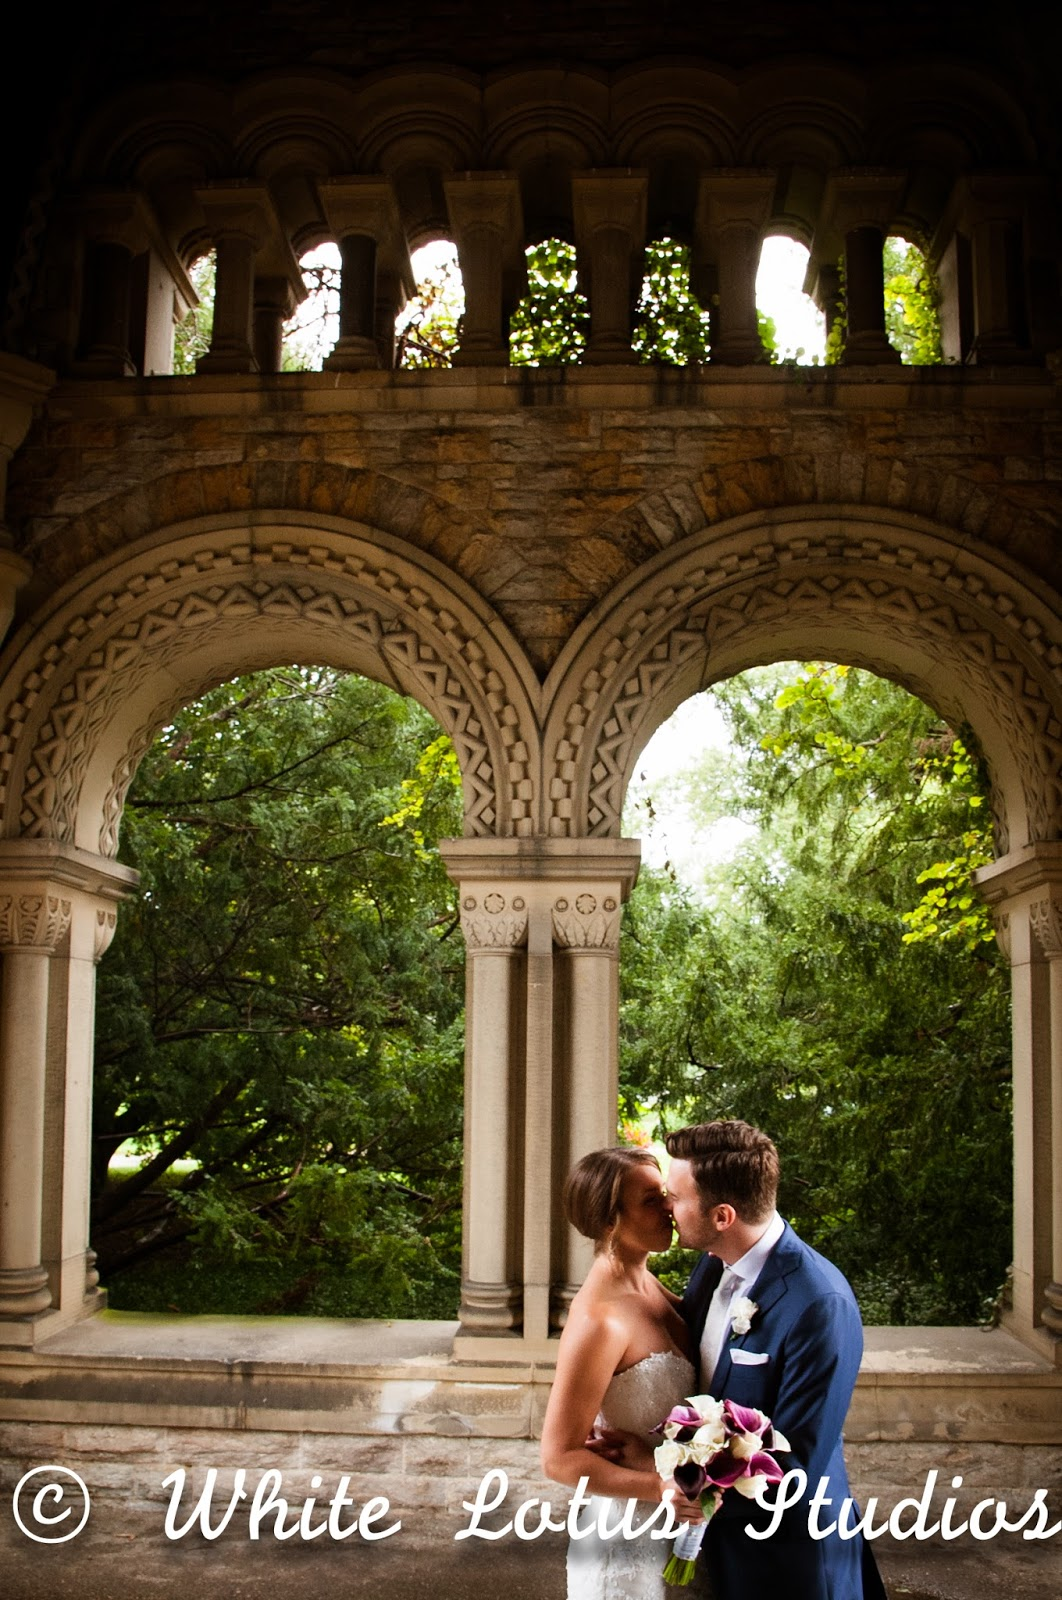 9•12•15 Robin and Alex\'s Wedding! | White Lotus Studios Wedding ...